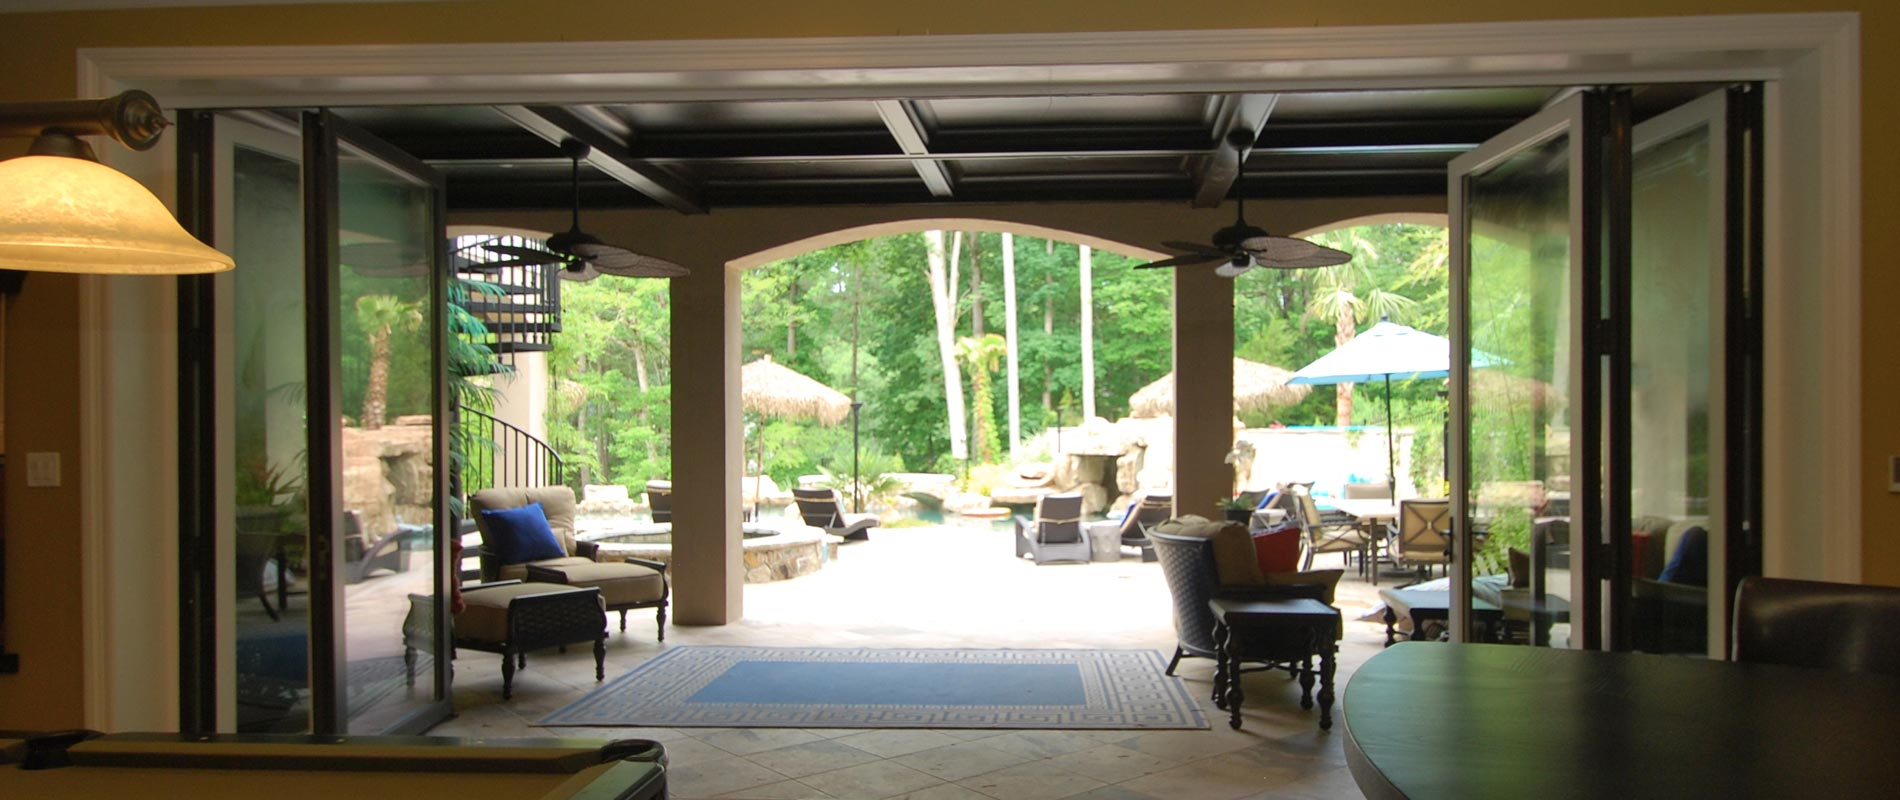 Recreational Area Renovation   Complete Construction Company   Apex, NC